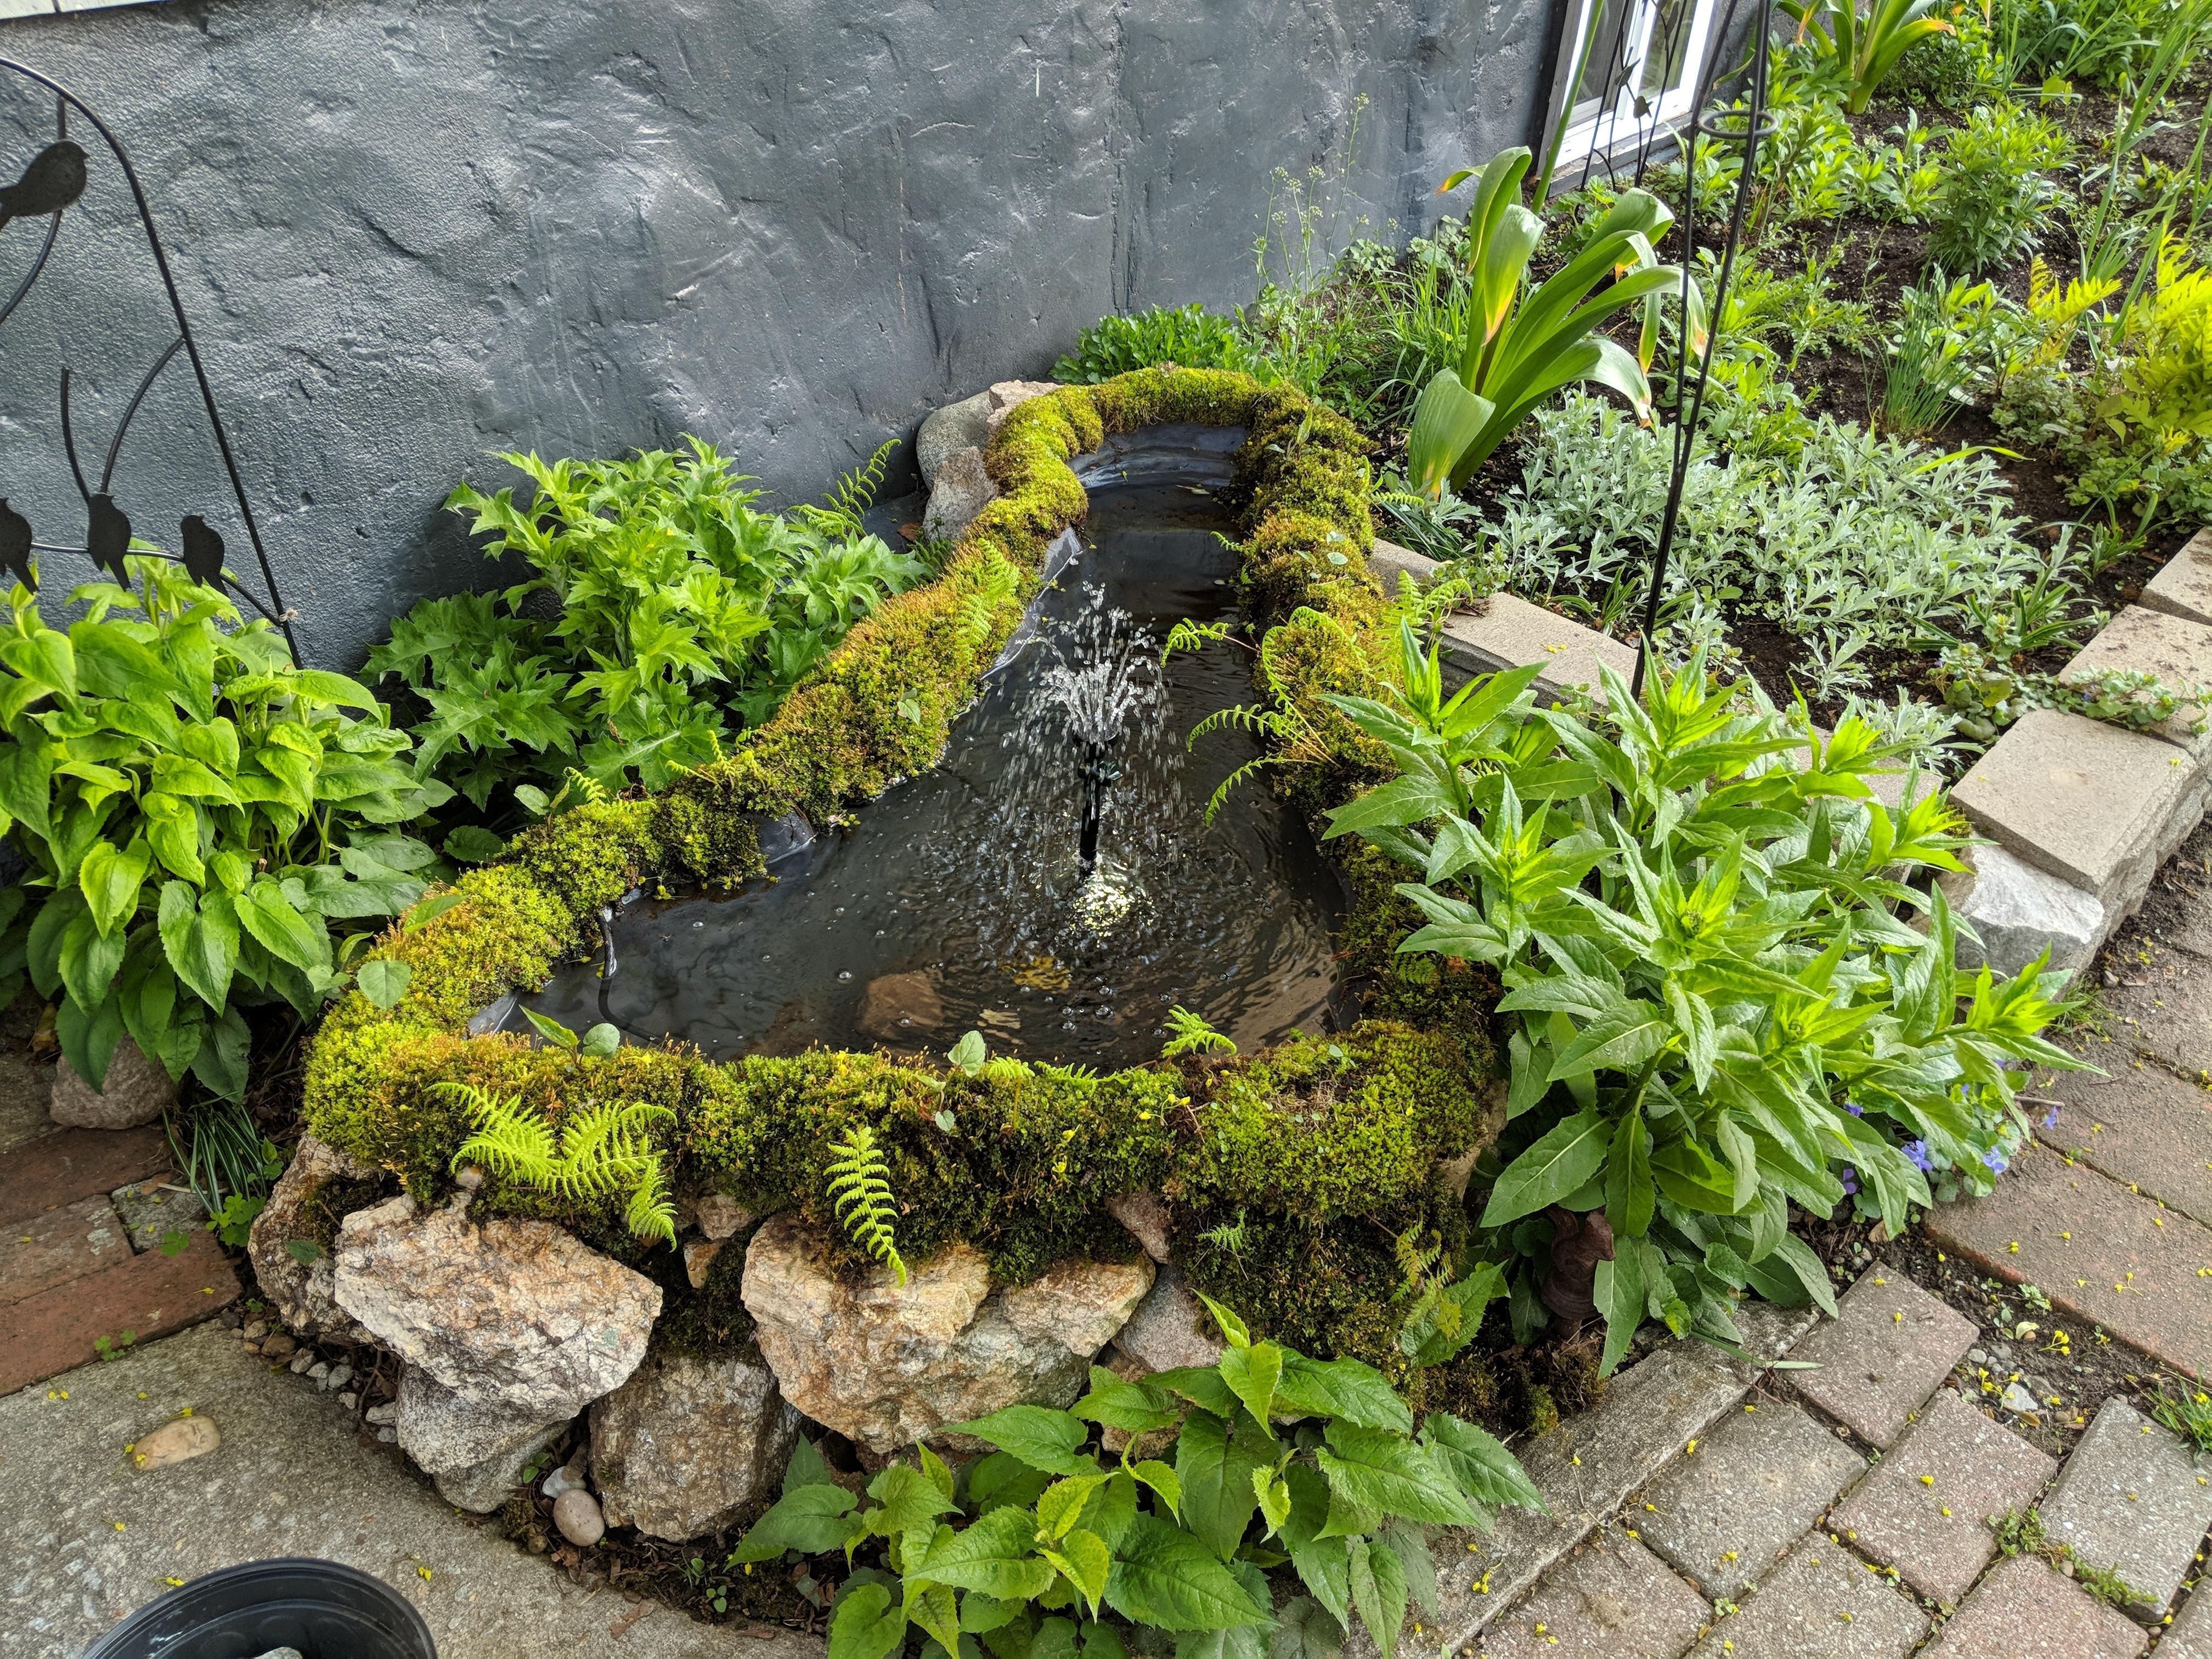 Small Pond For Our Wildlife Buddies #Gardening #Garden #Diy #Home